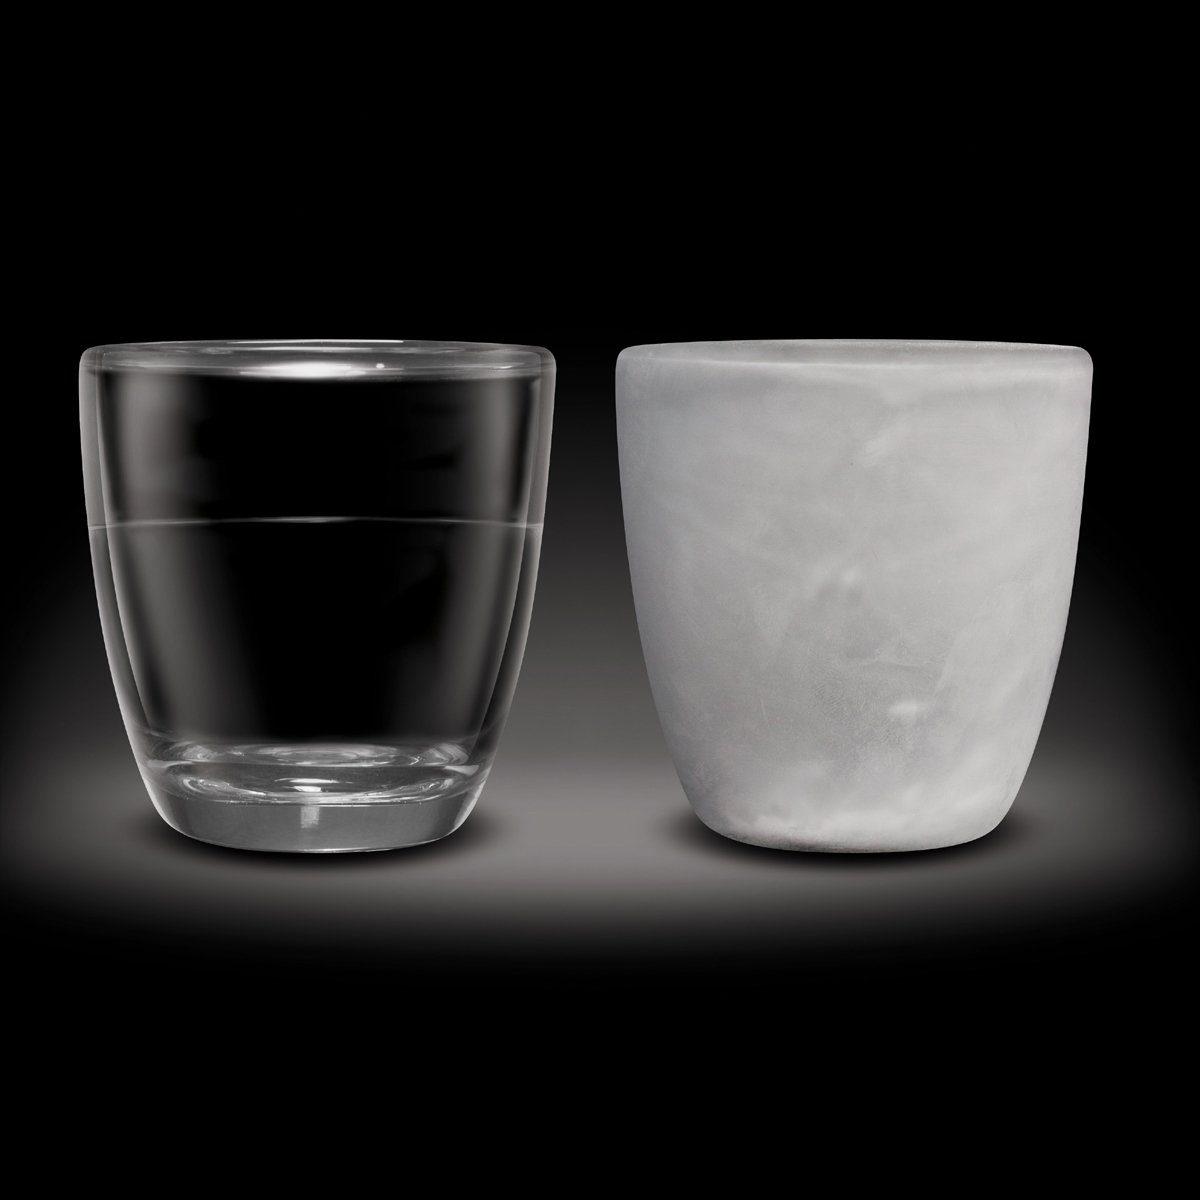 Amsterdam Glass Amsterdam Glass Saft Glas 0.2 l , 2er-Set